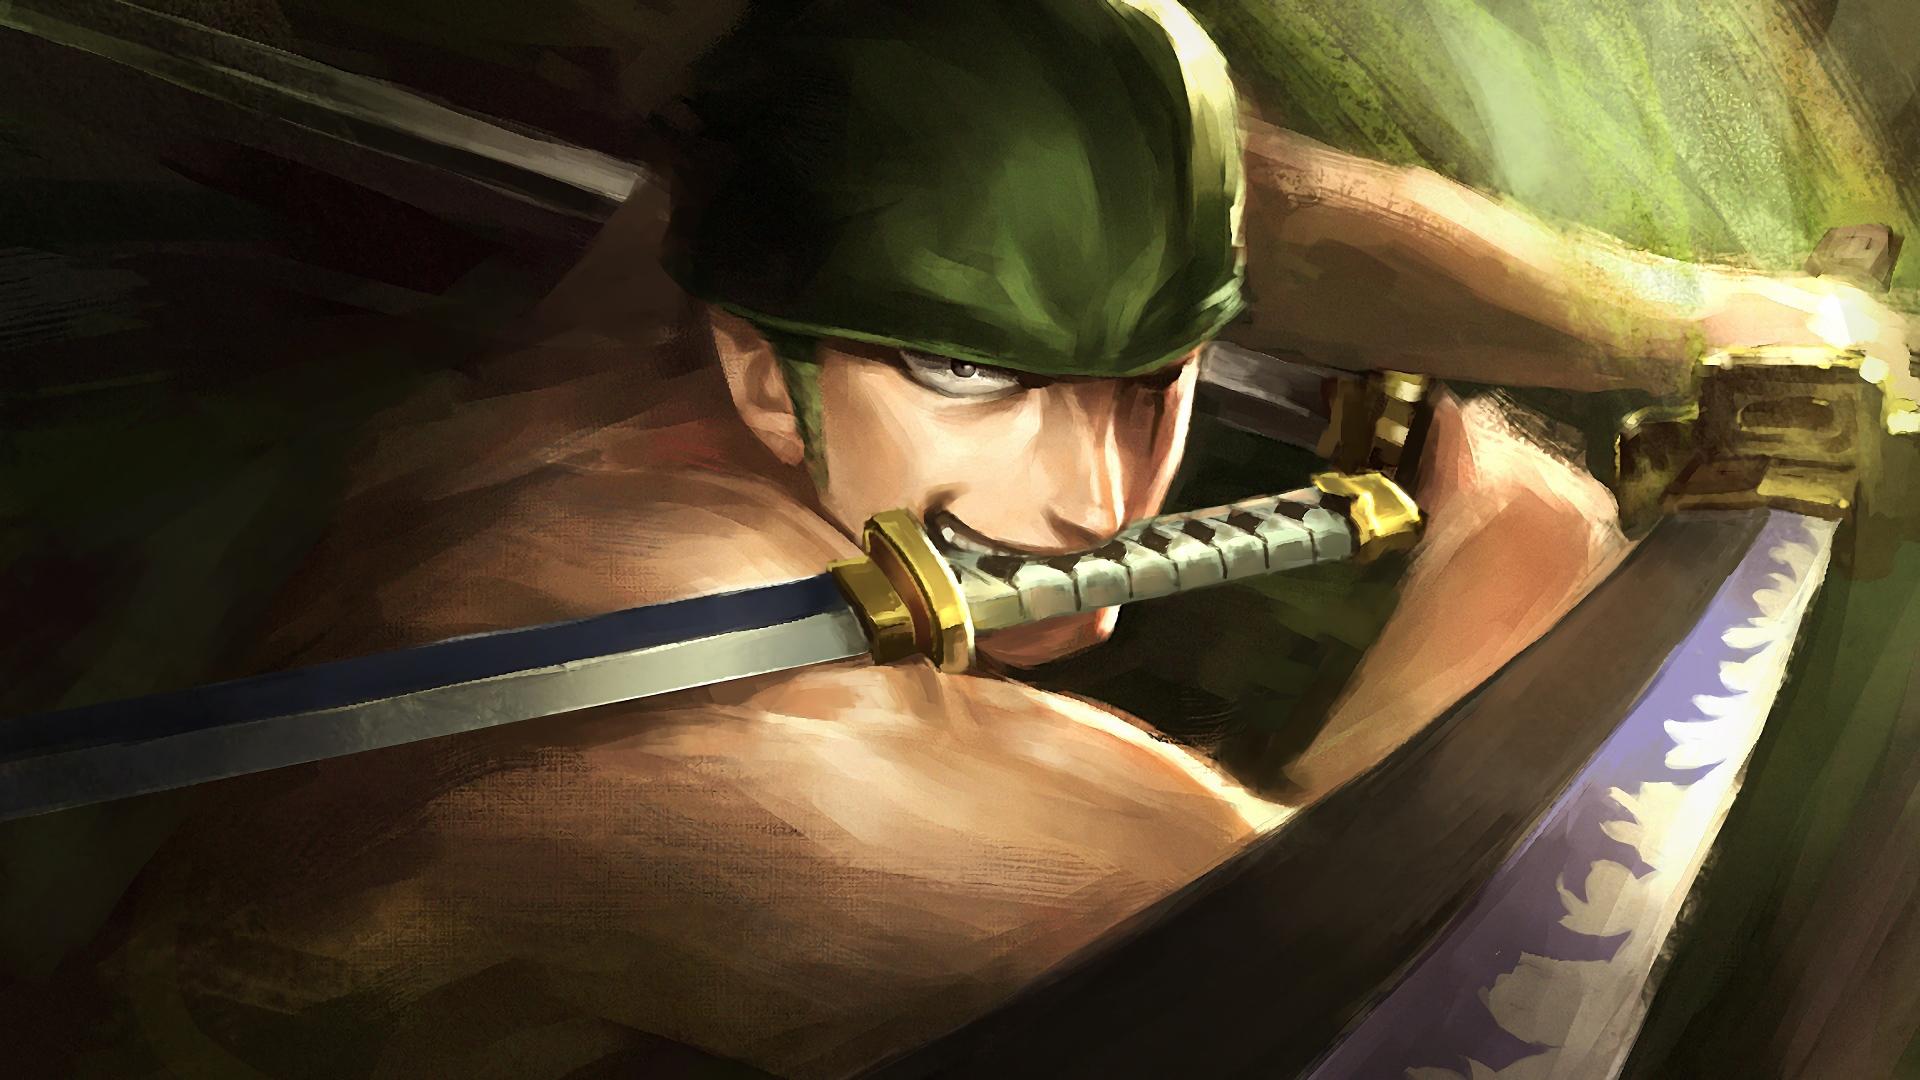 Download 1920x1080 Wallpaper Artwork Warrior Roronoa Zoro One Piece Full Hd Hdtv Fhd 1080p 1920x1080 Hd Image Background 10054